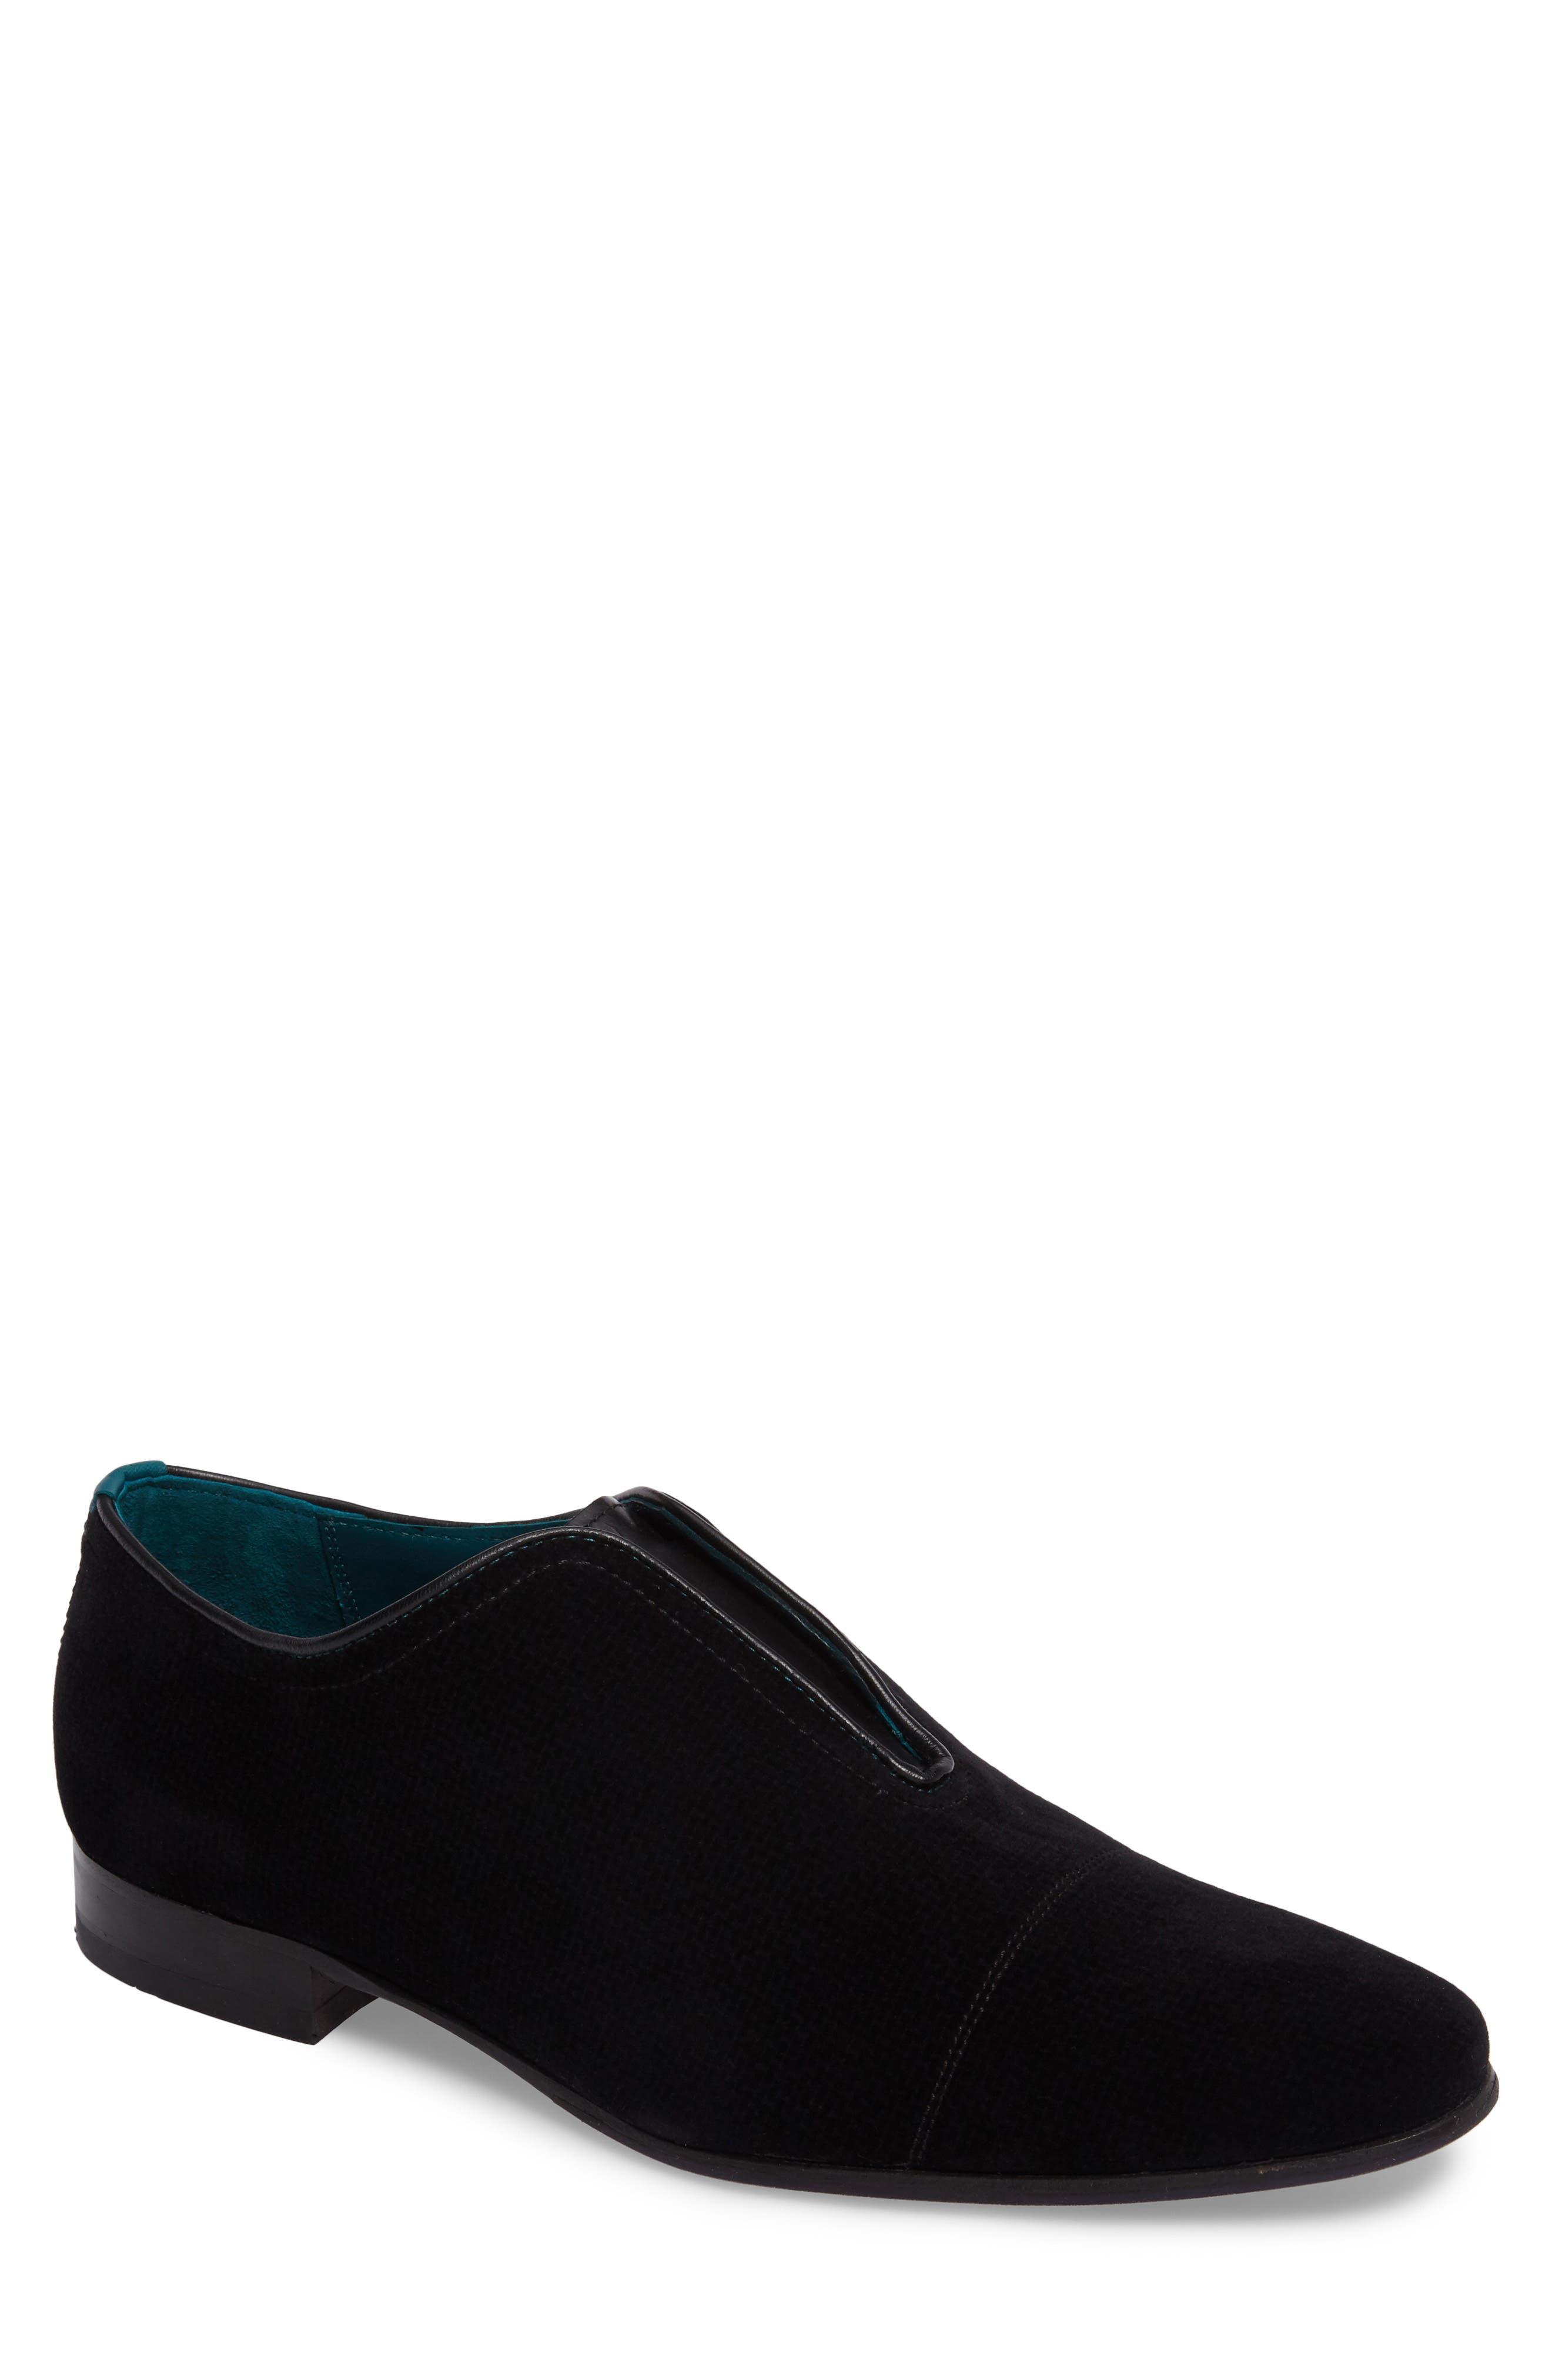 Ehmitt Venetian Loafer,                         Main,                         color, 001